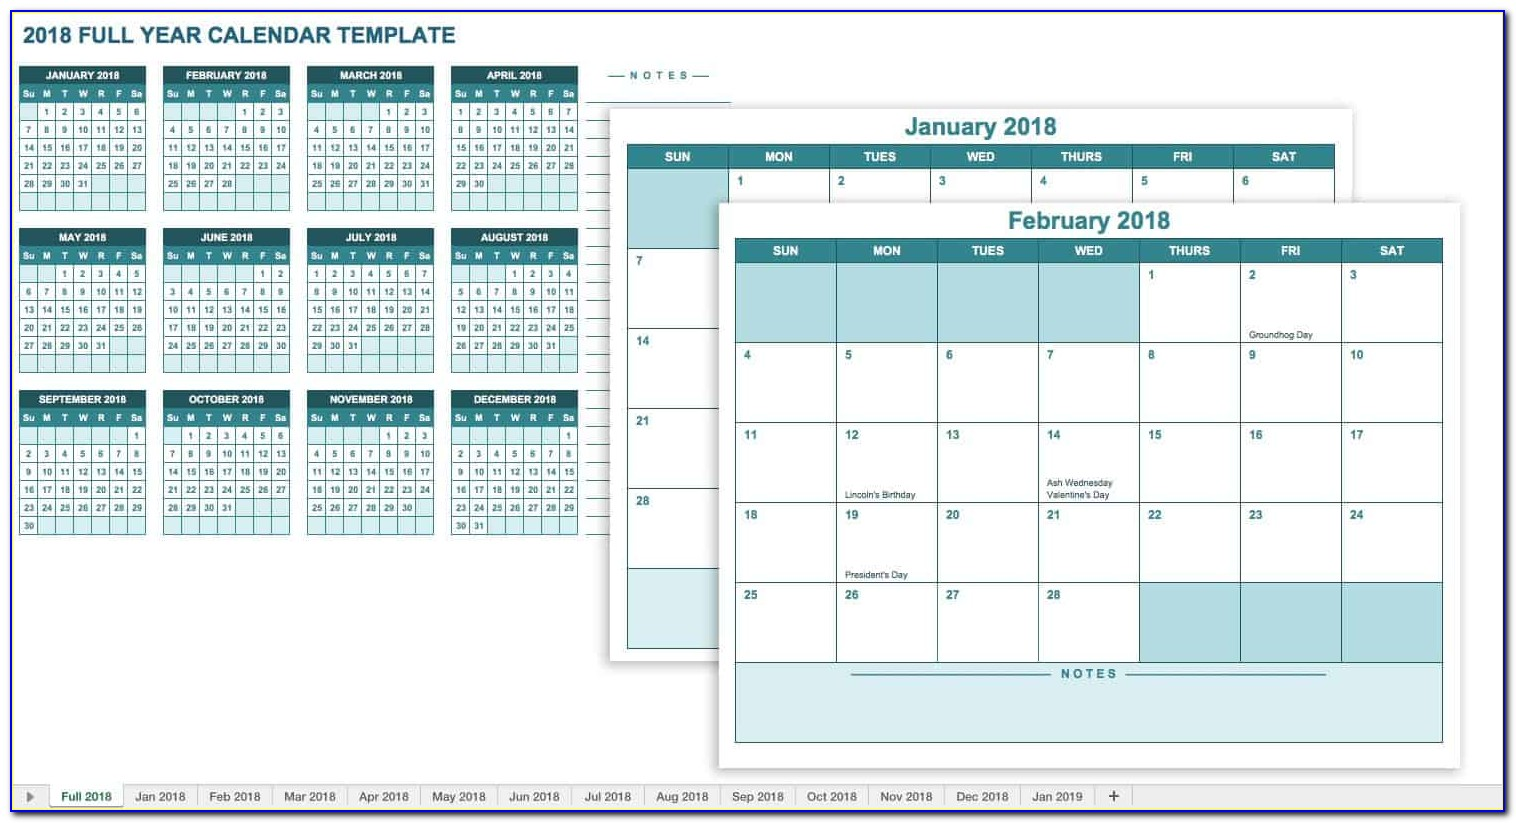 Excel Spreadsheet Budget Planner Template